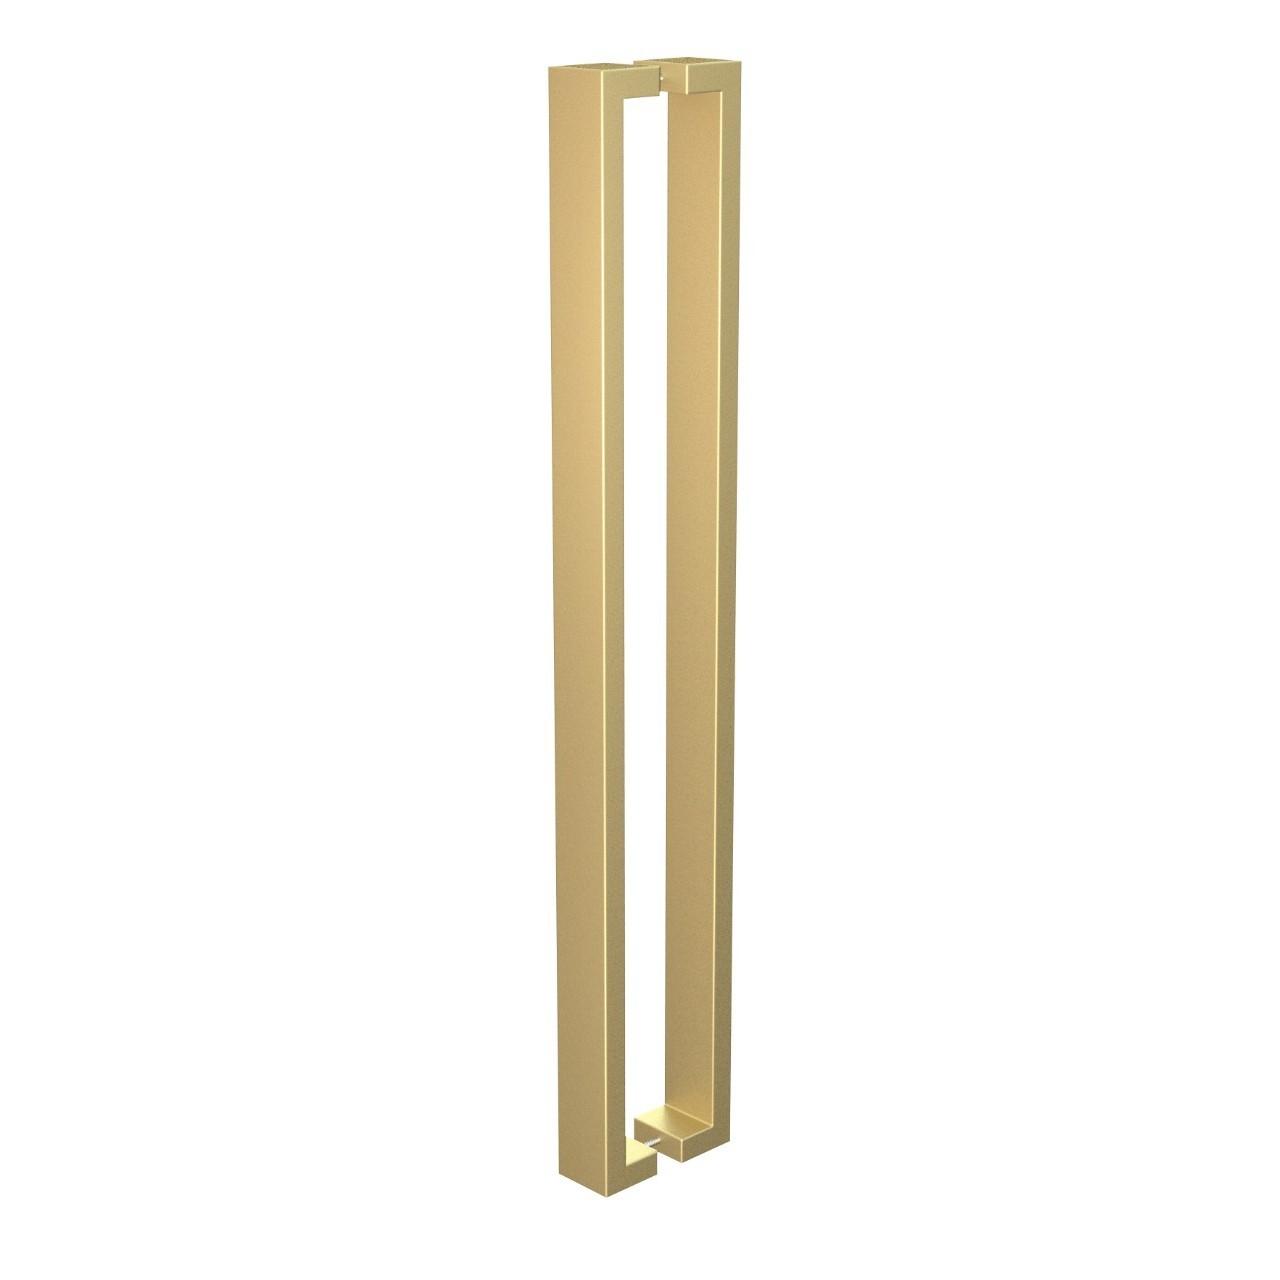 Puxador de Portas Sobrepor Aco Inox 101cm 1 par Leblon Gold - Acobrasil